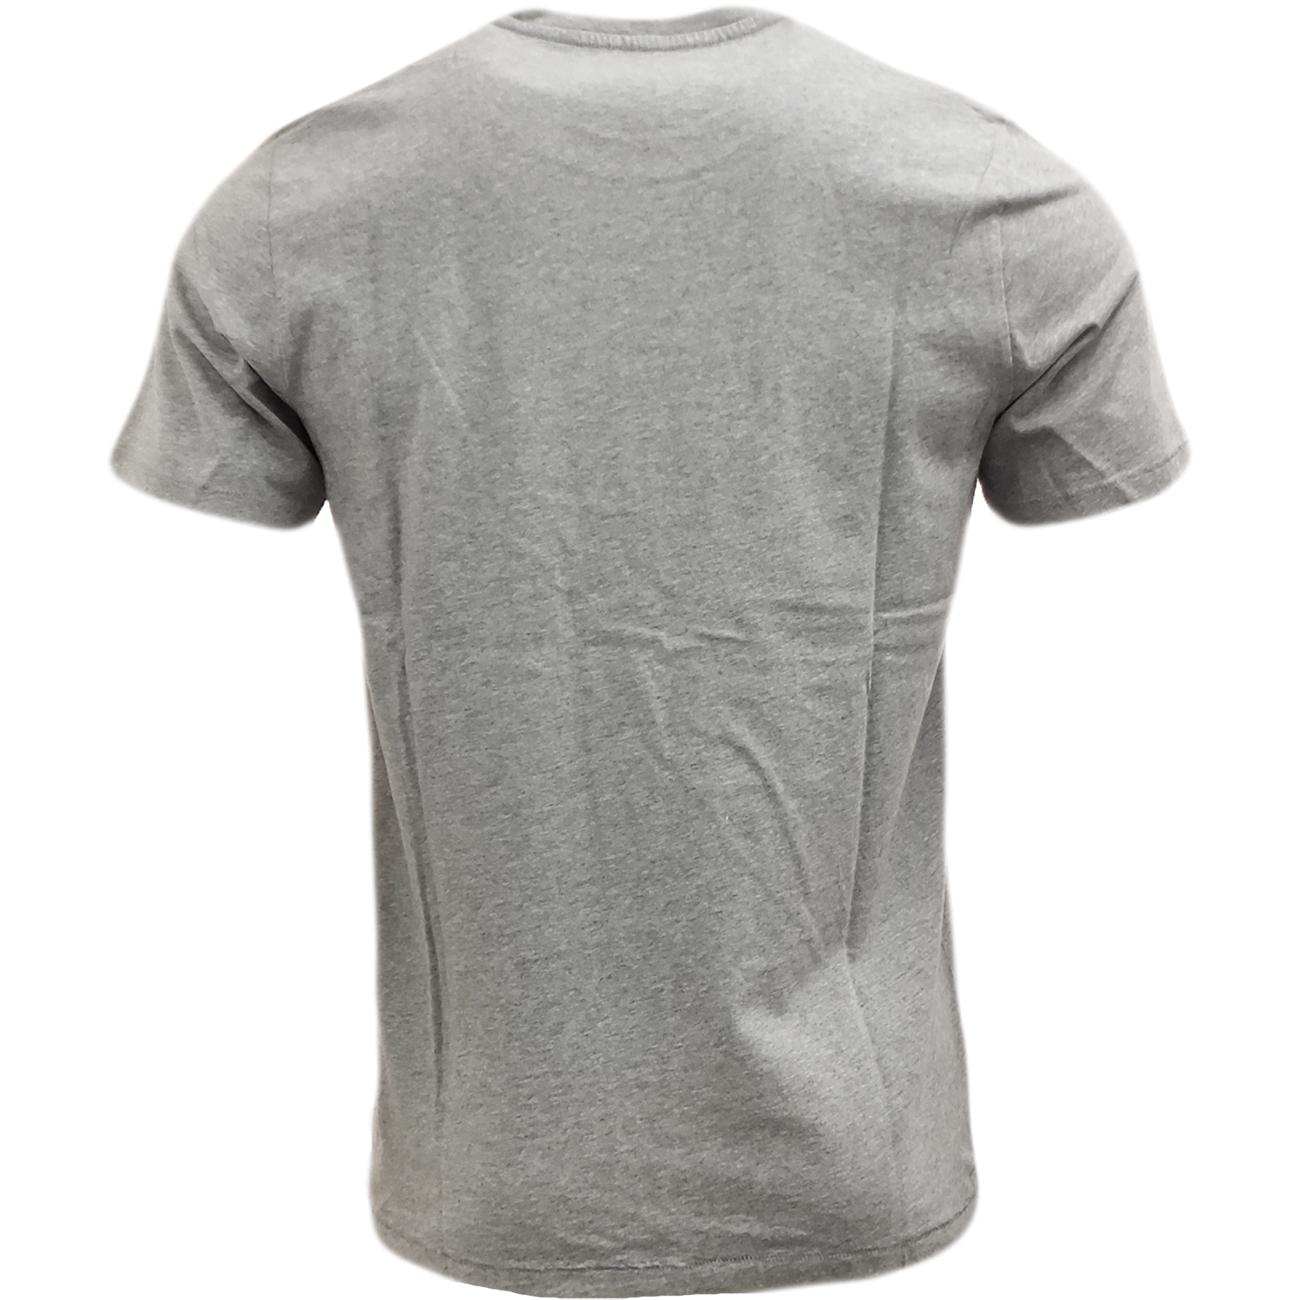 Levi strauss t shirt 17783 ebay for Levis plain t shirts